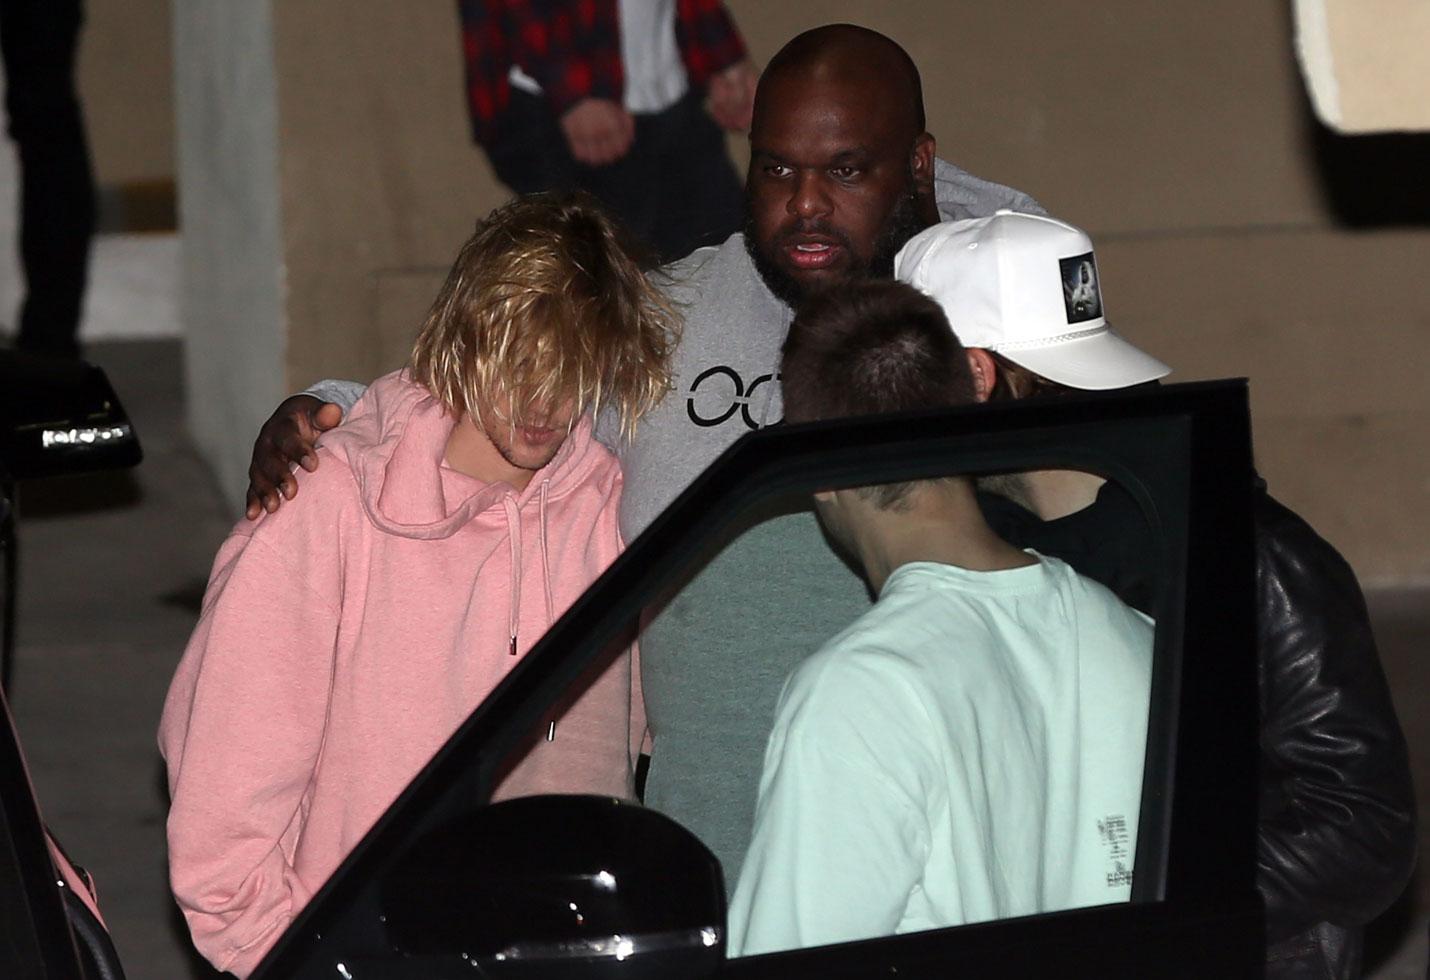 Justin Bieber Selena Gomez hospital church comfort